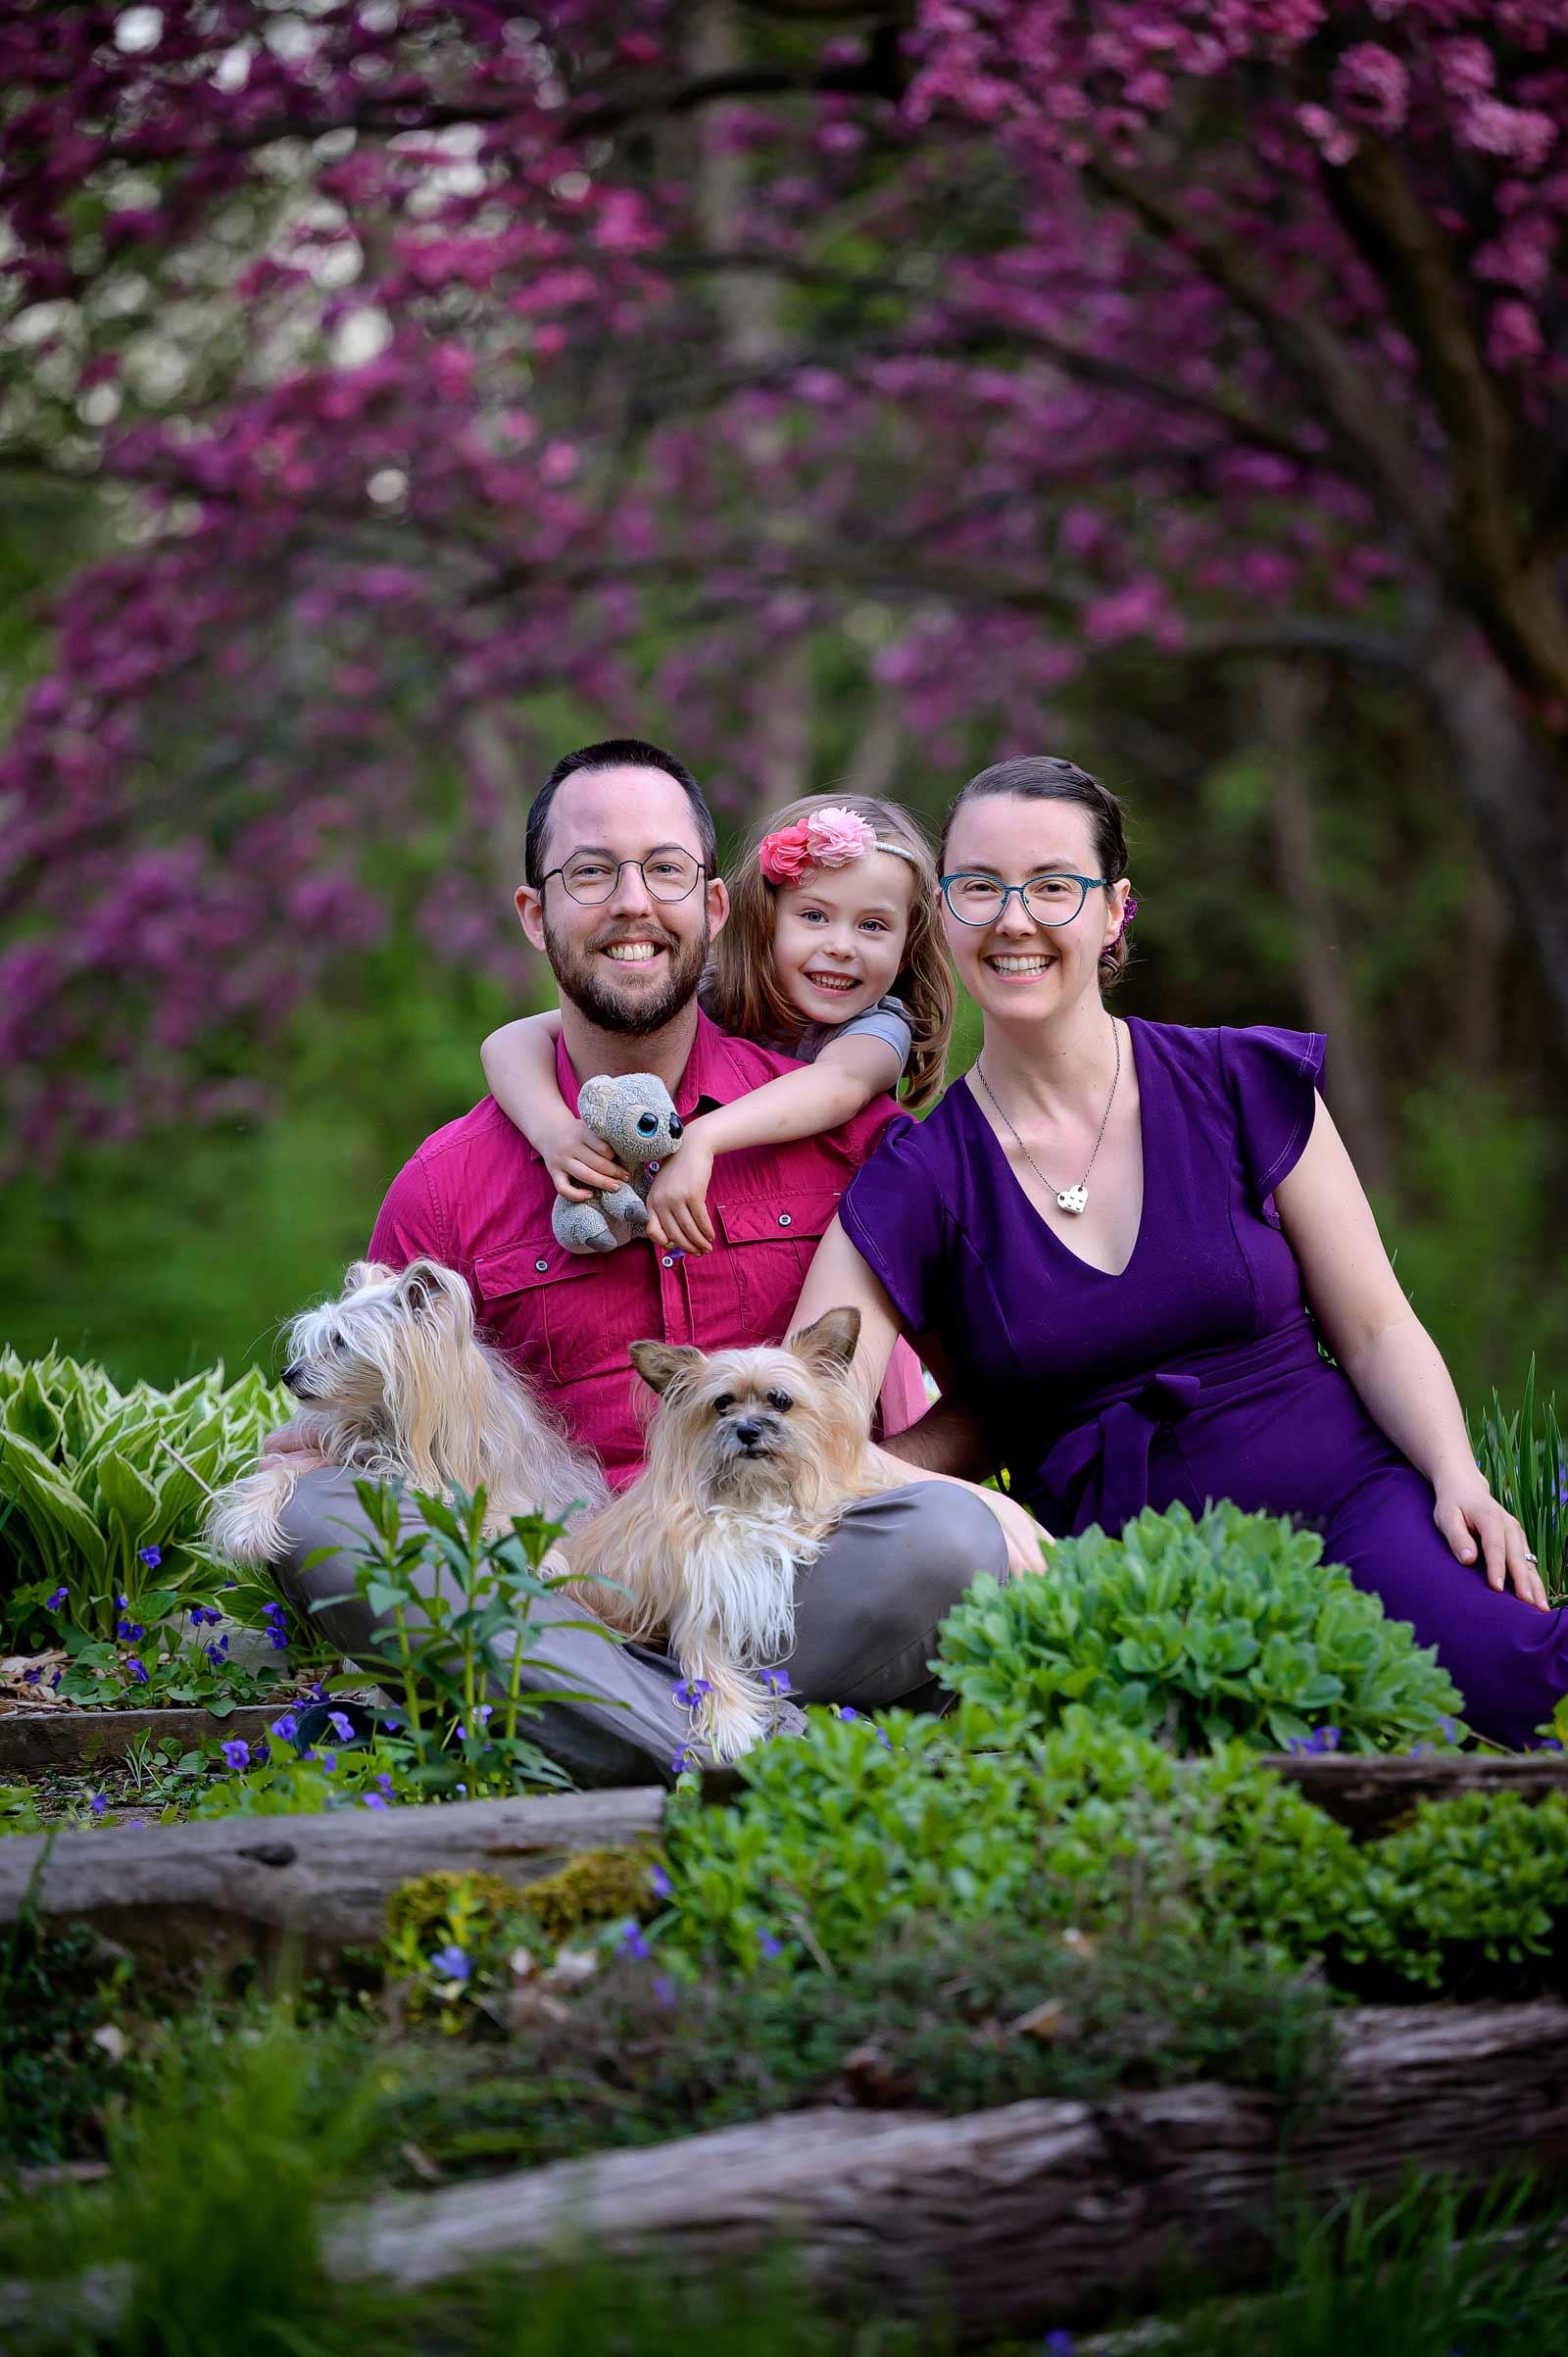 bradleyfamily-spring2021-30